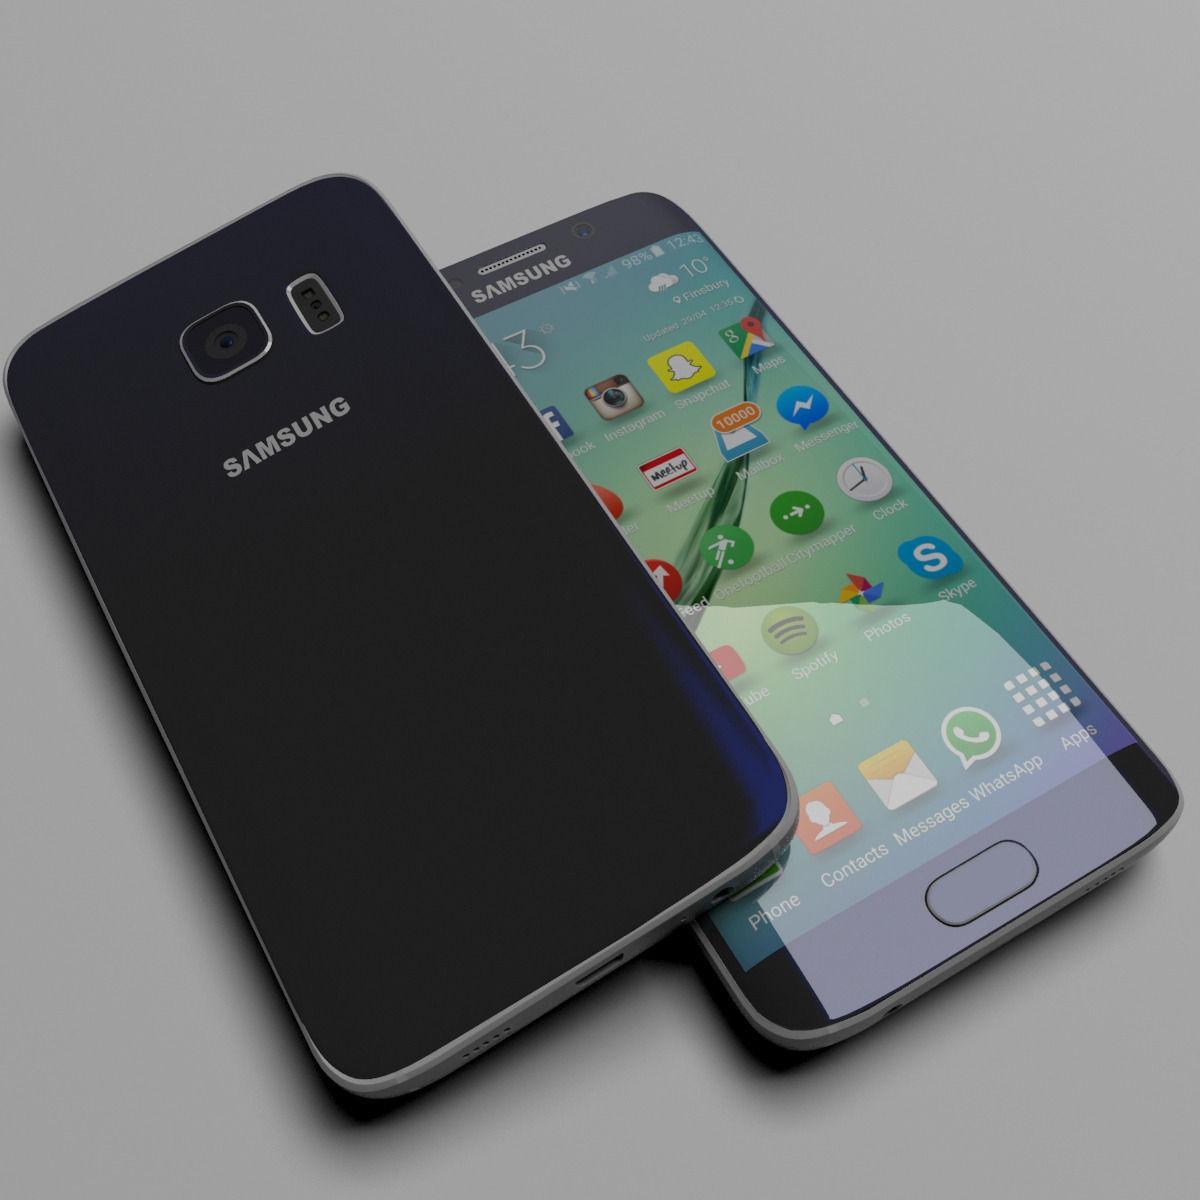 Caremobile nhận thay pin Samsung S6, S6 Edge & các model khác.